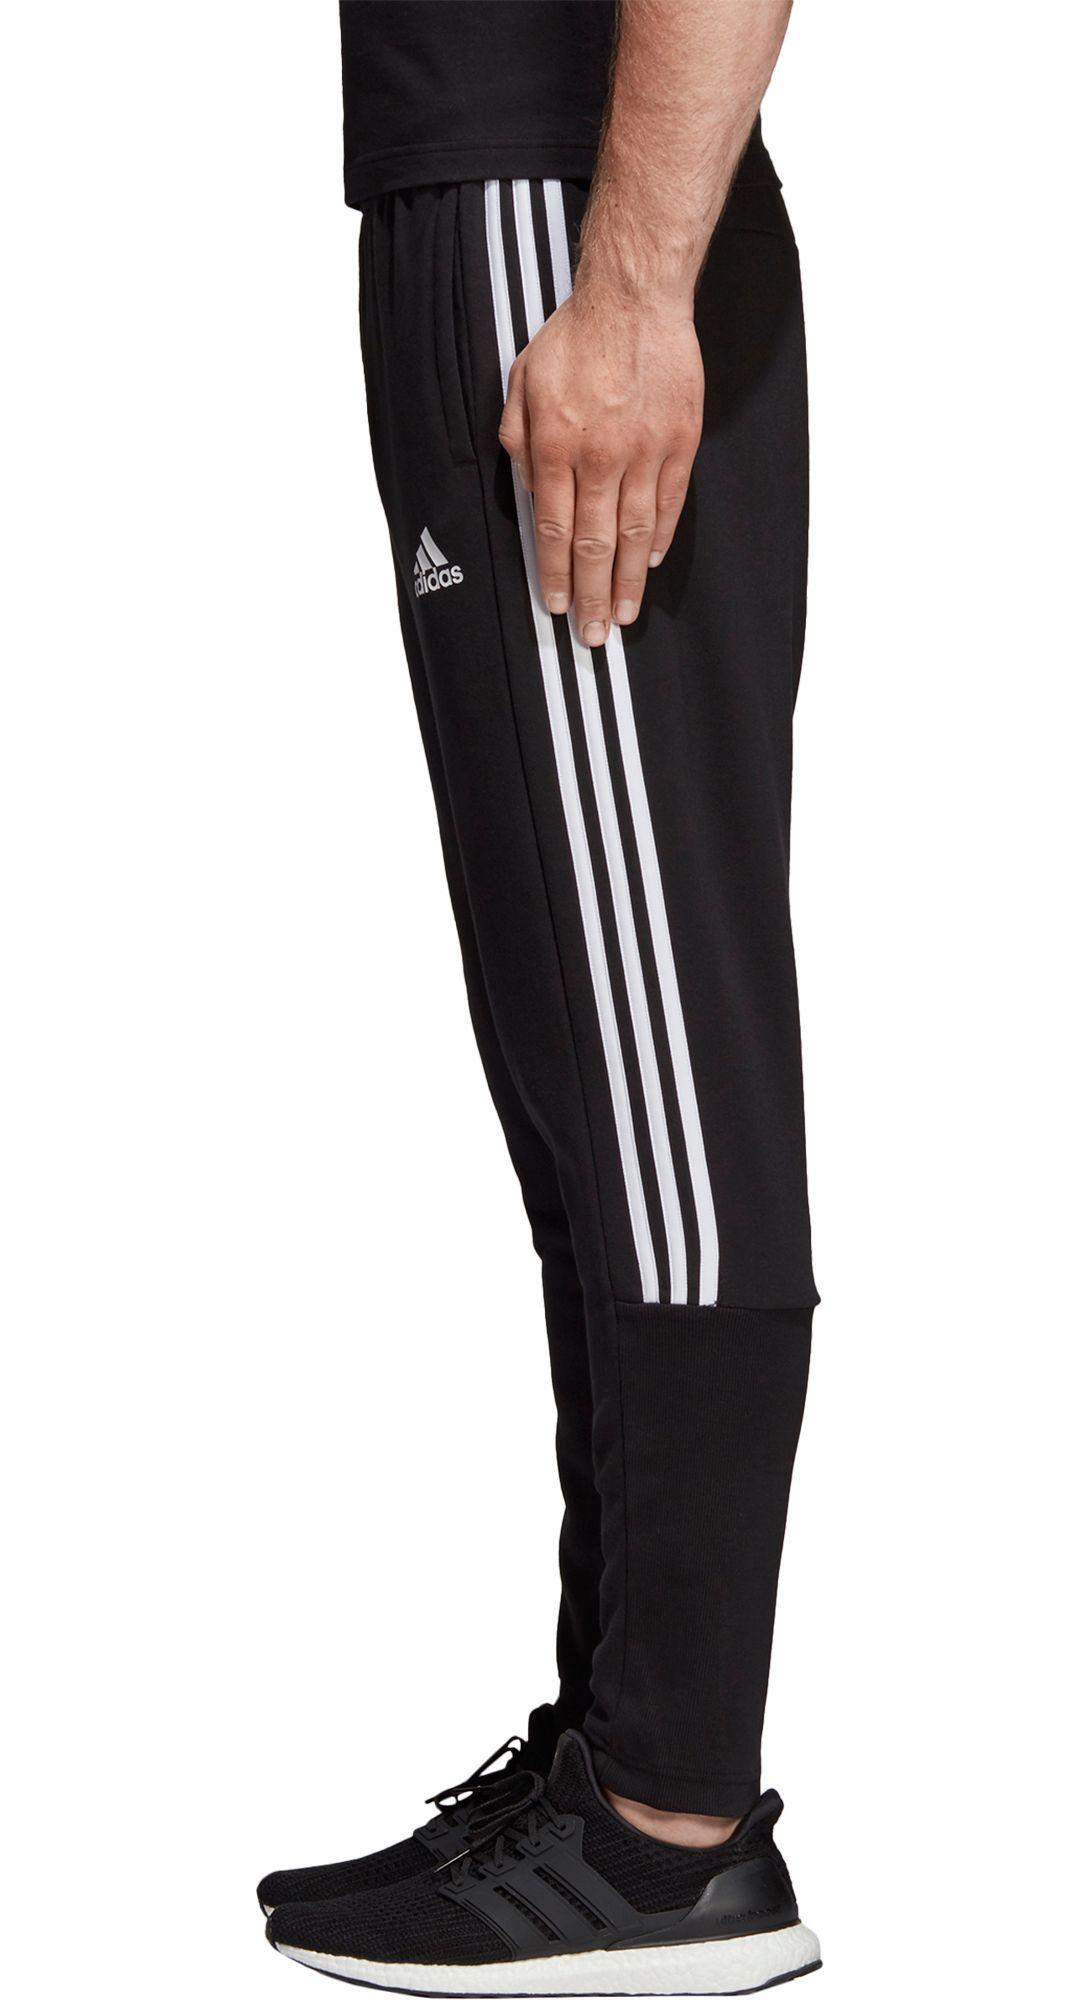 b84b4330026 adidas Men's Must Haves 3-Stripes Tiro Pants. noImageFound. Previous